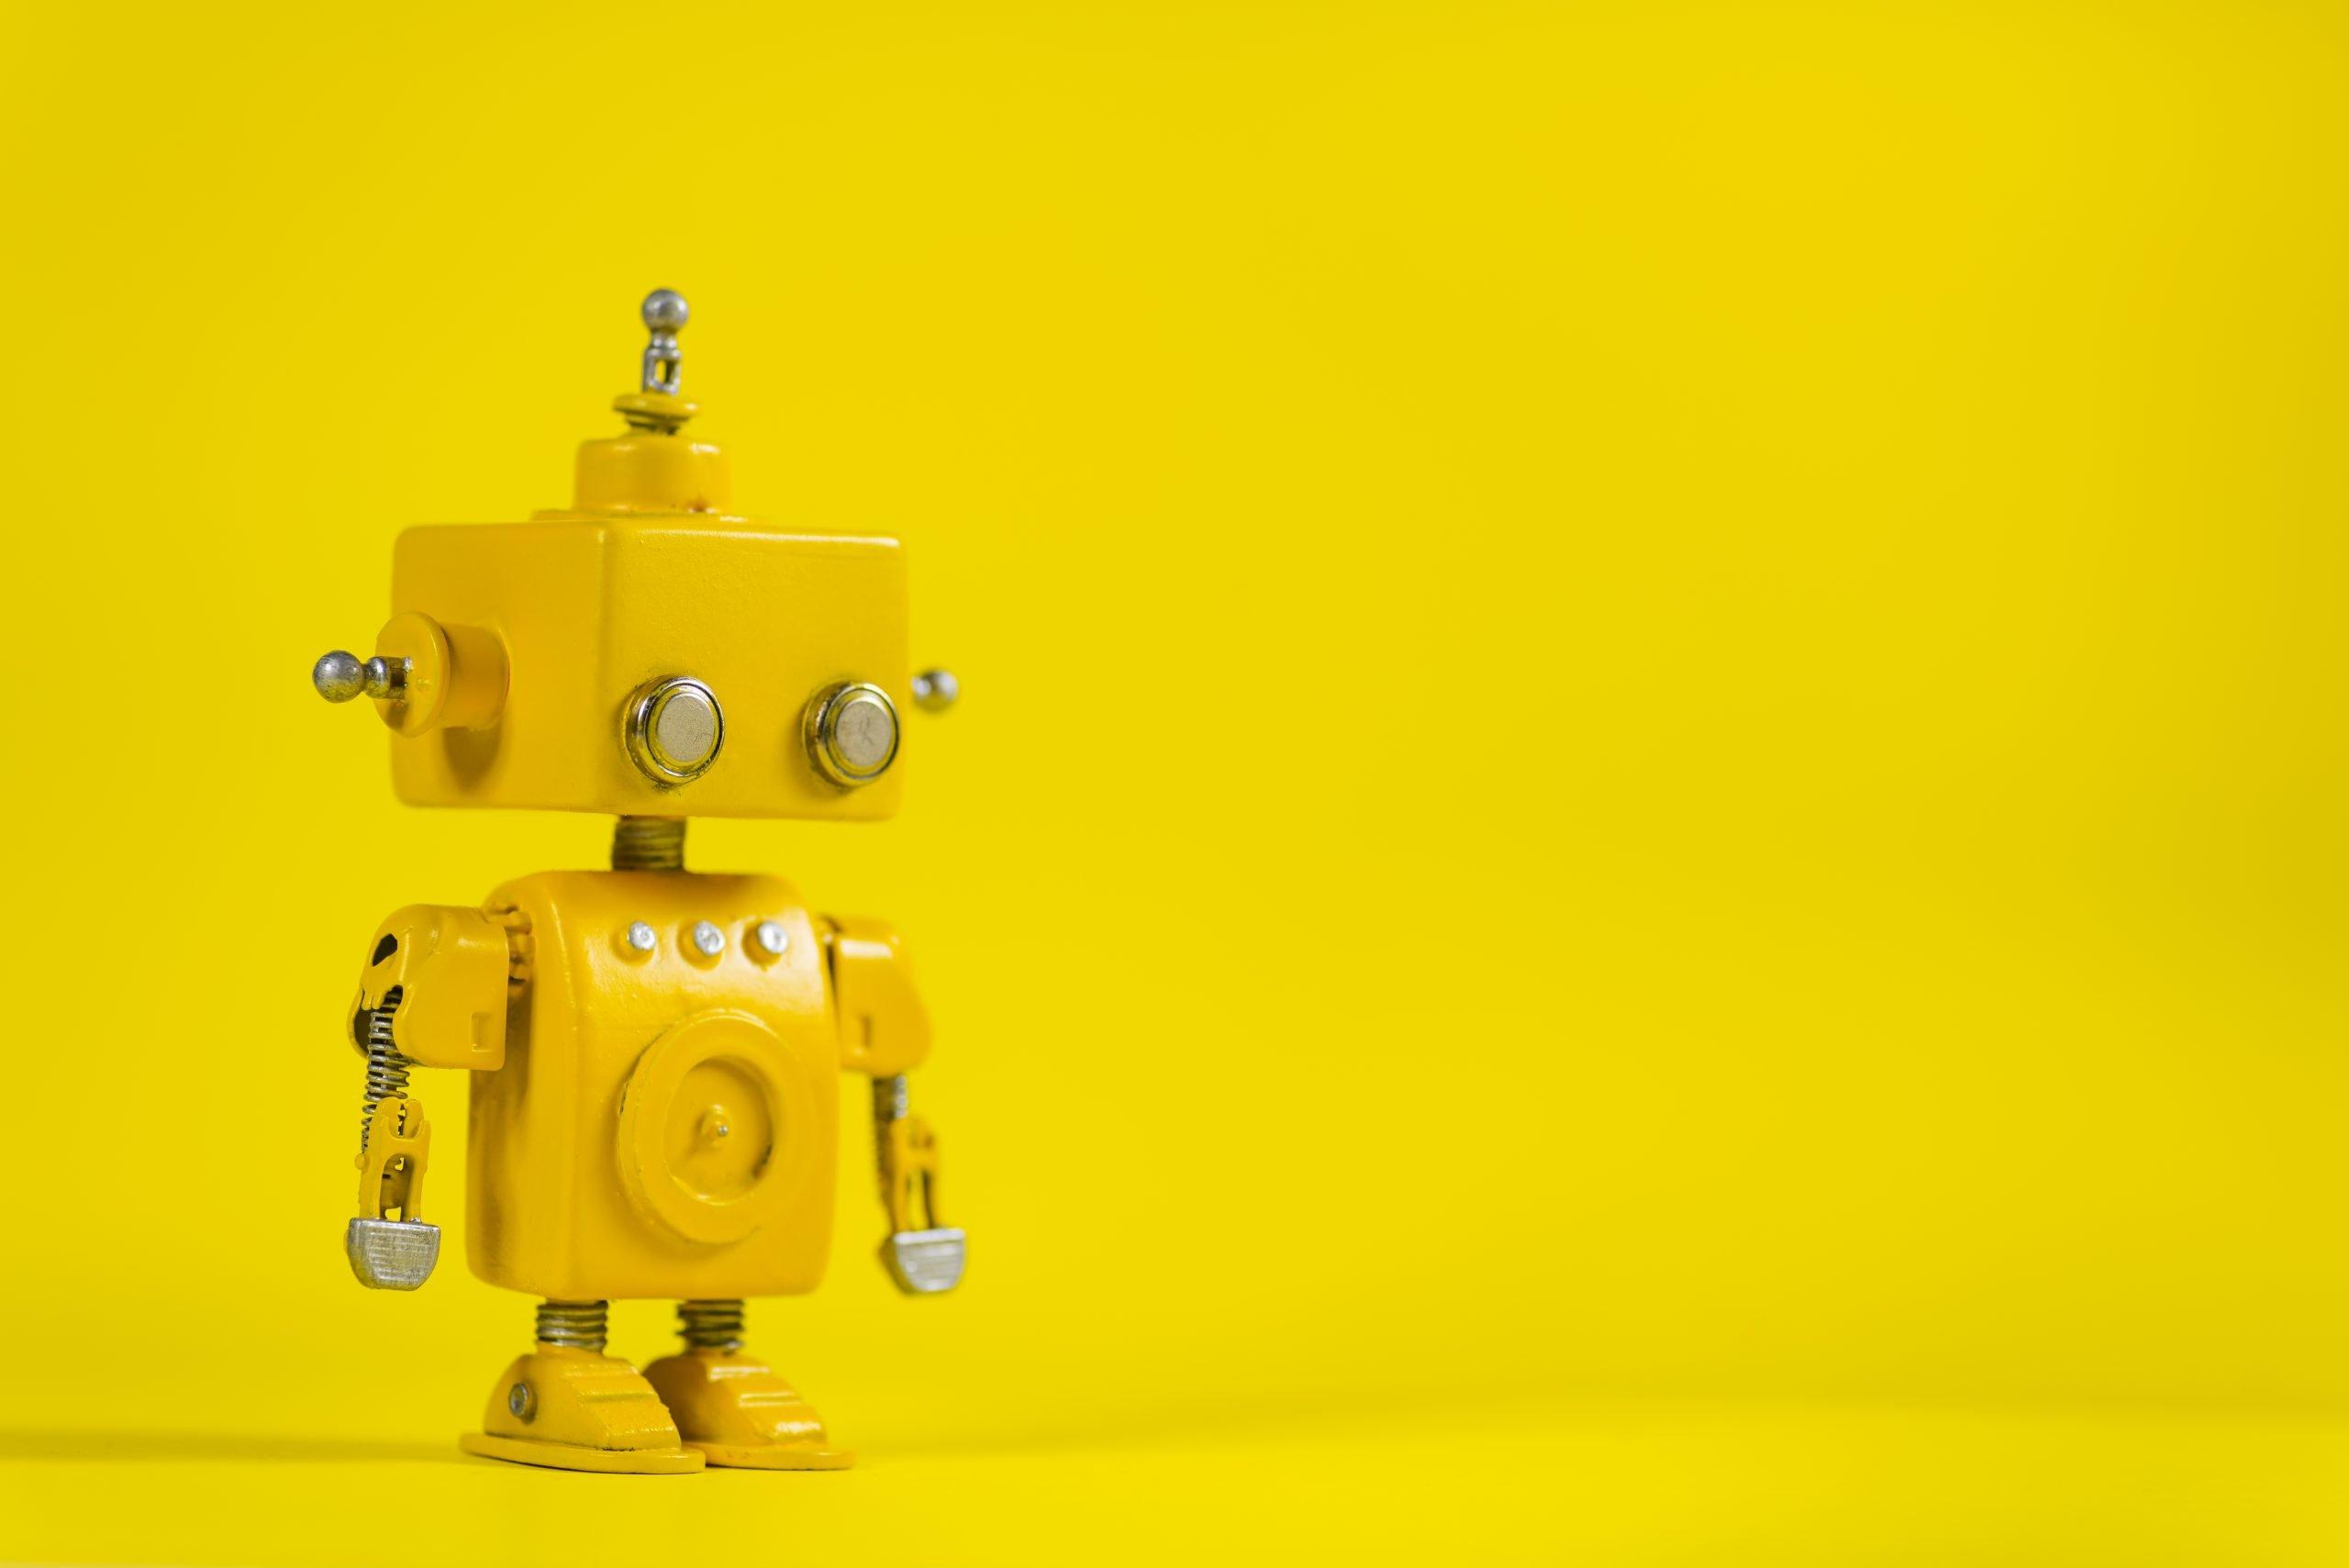 Robot on a yellow background   GO FAIR 2560x1709